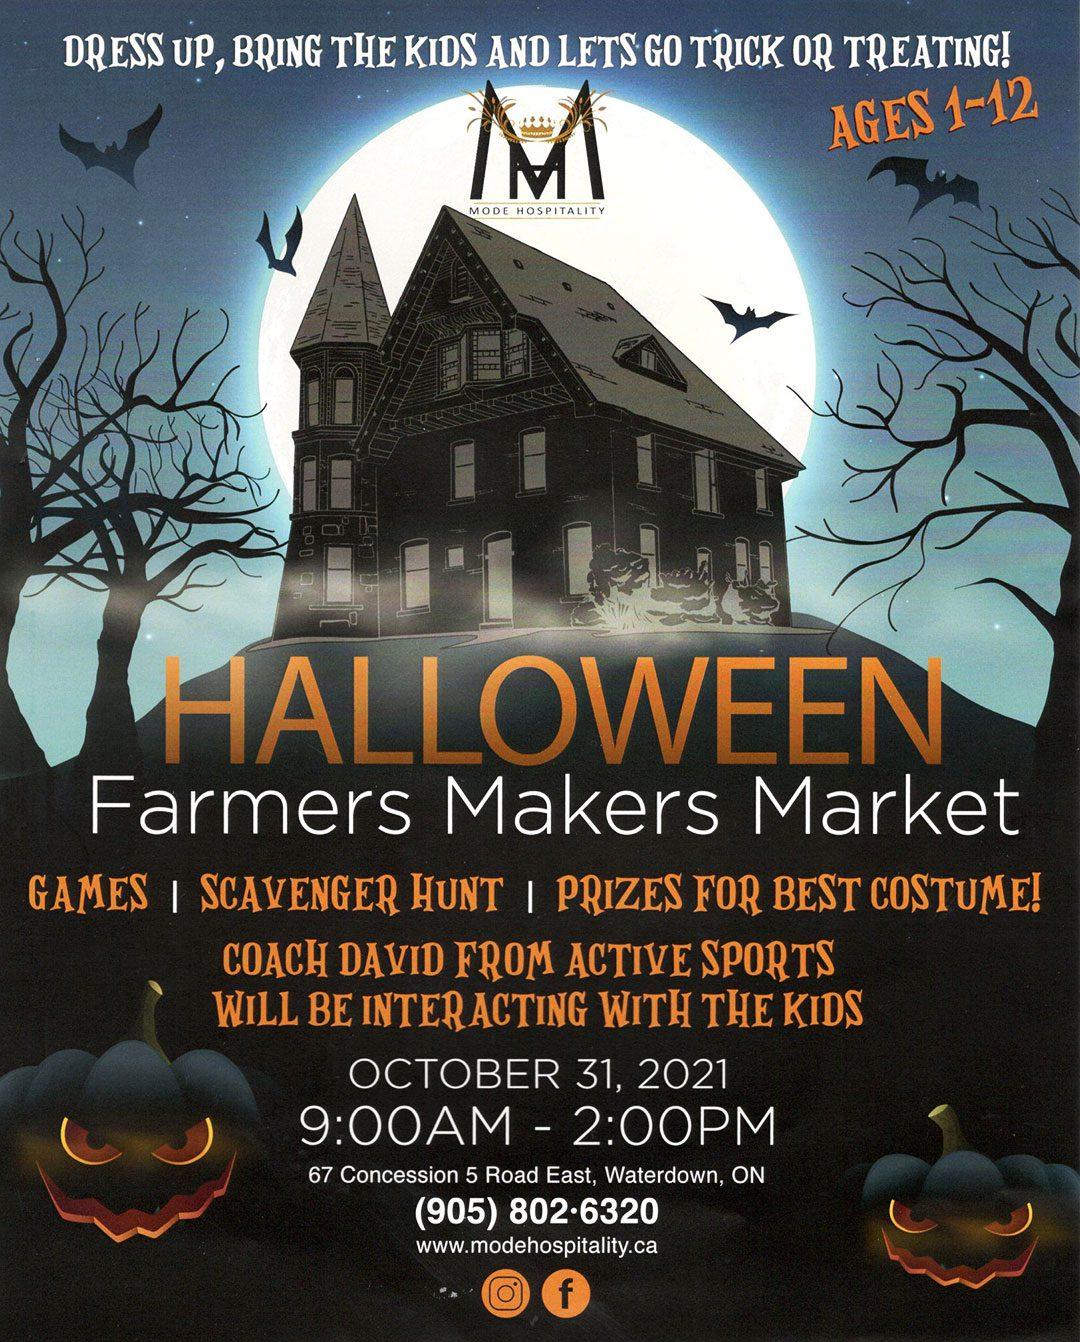 Halloween Farmers Makers Market by Mode Hospitality